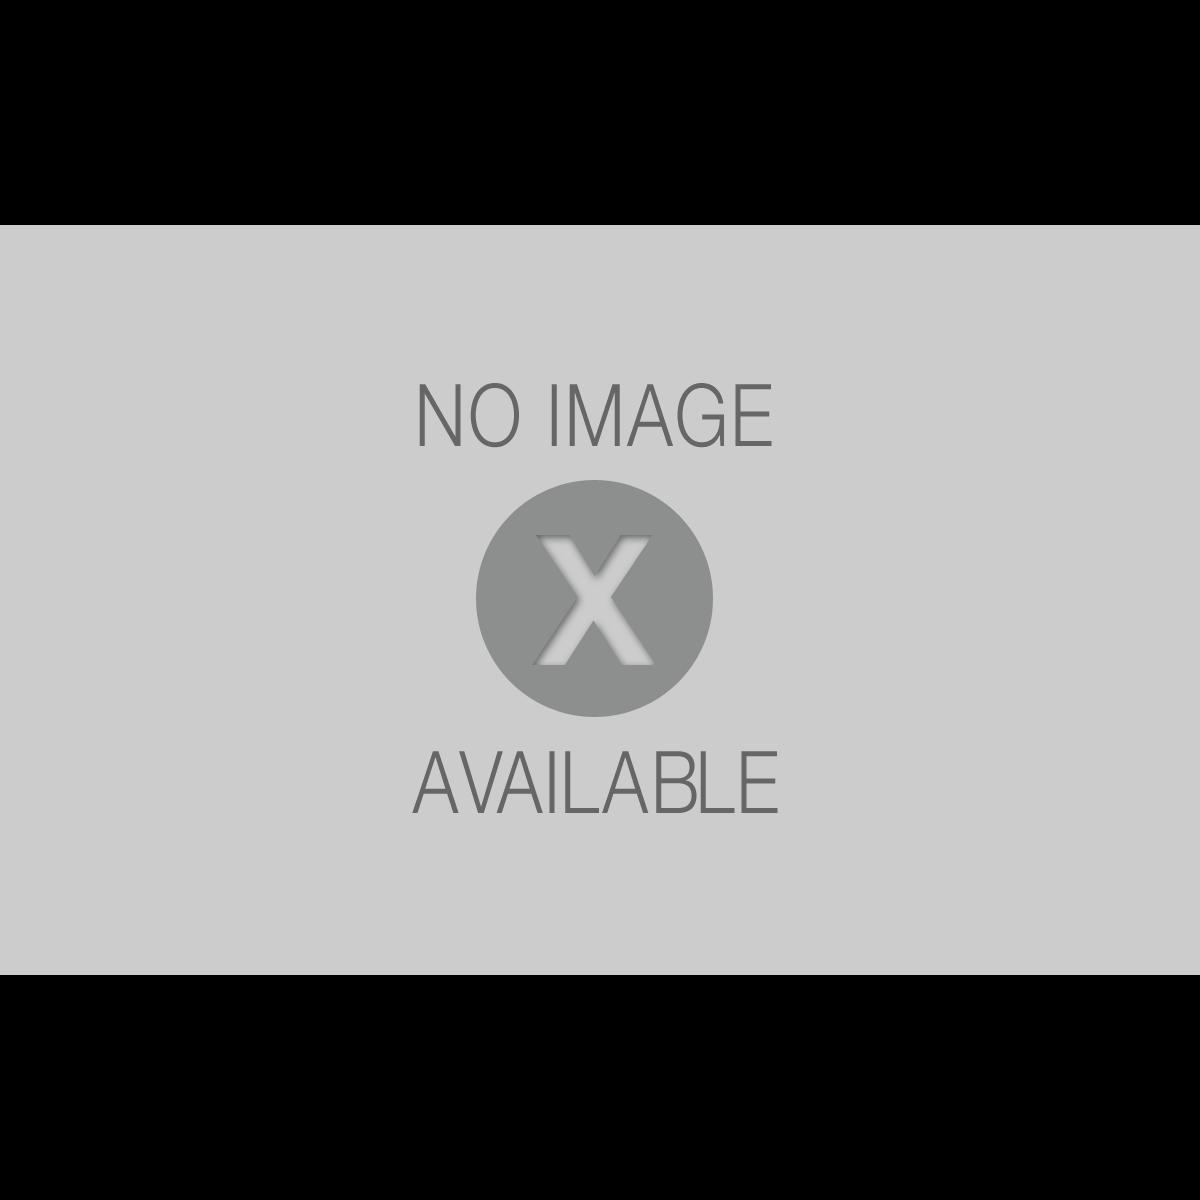 Mastice per top cucina: prezzi e offerte online